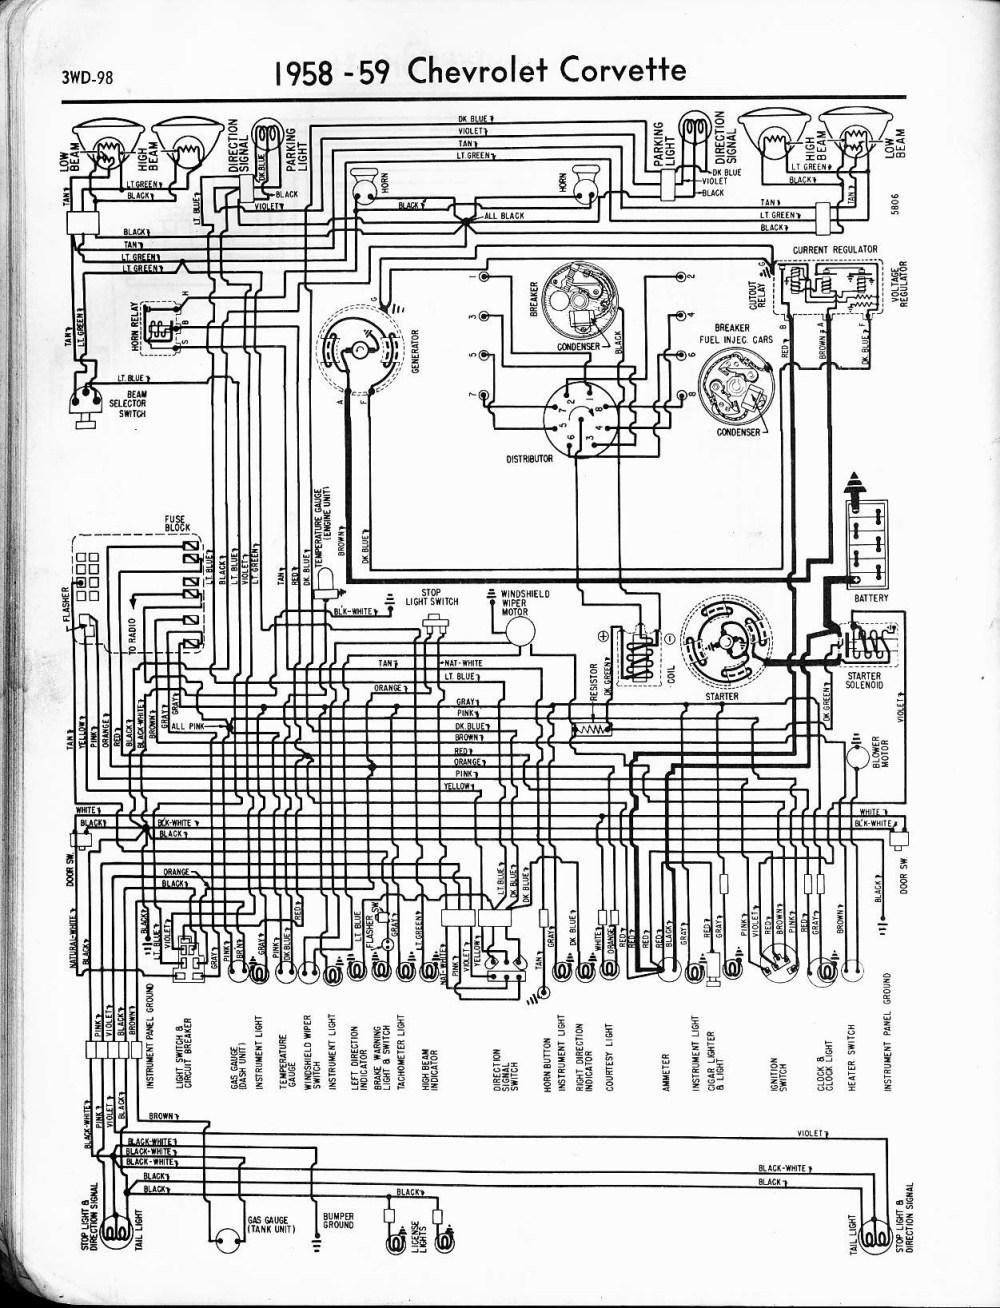 medium resolution of 1979 corvette wiring diagram 57 65 chevy wiring diagrams my wiring rh detoxicrecenze com 1979 k5